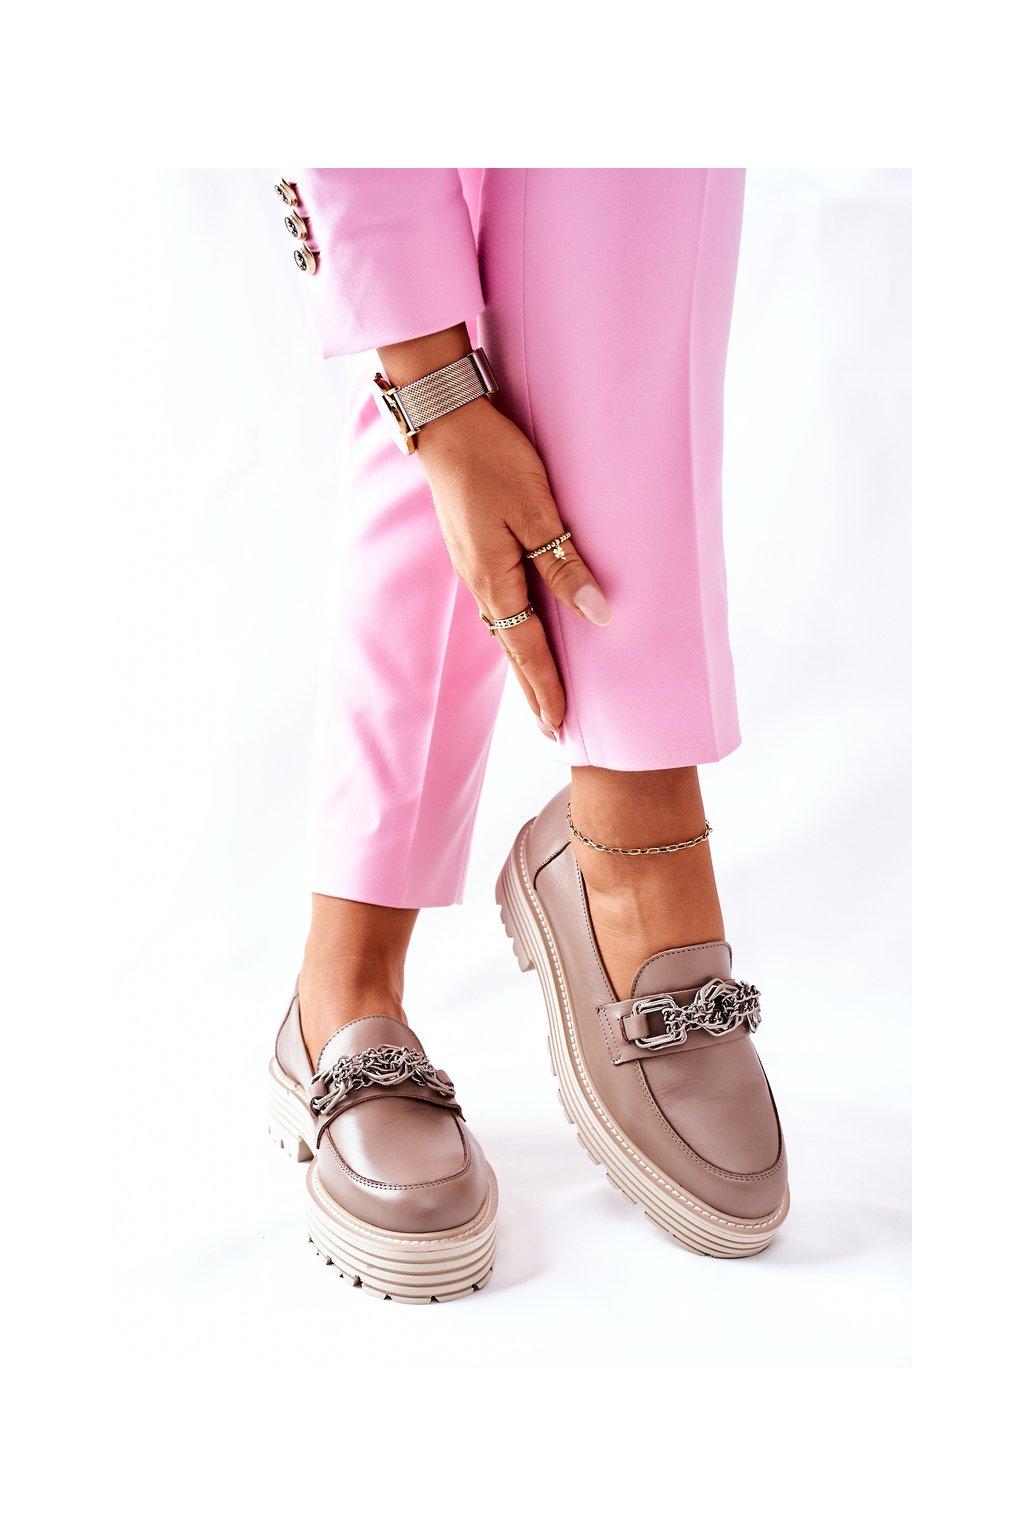 Dámske poltopánky farba hnedá kód obuvi 2383 136 D.BEIGE